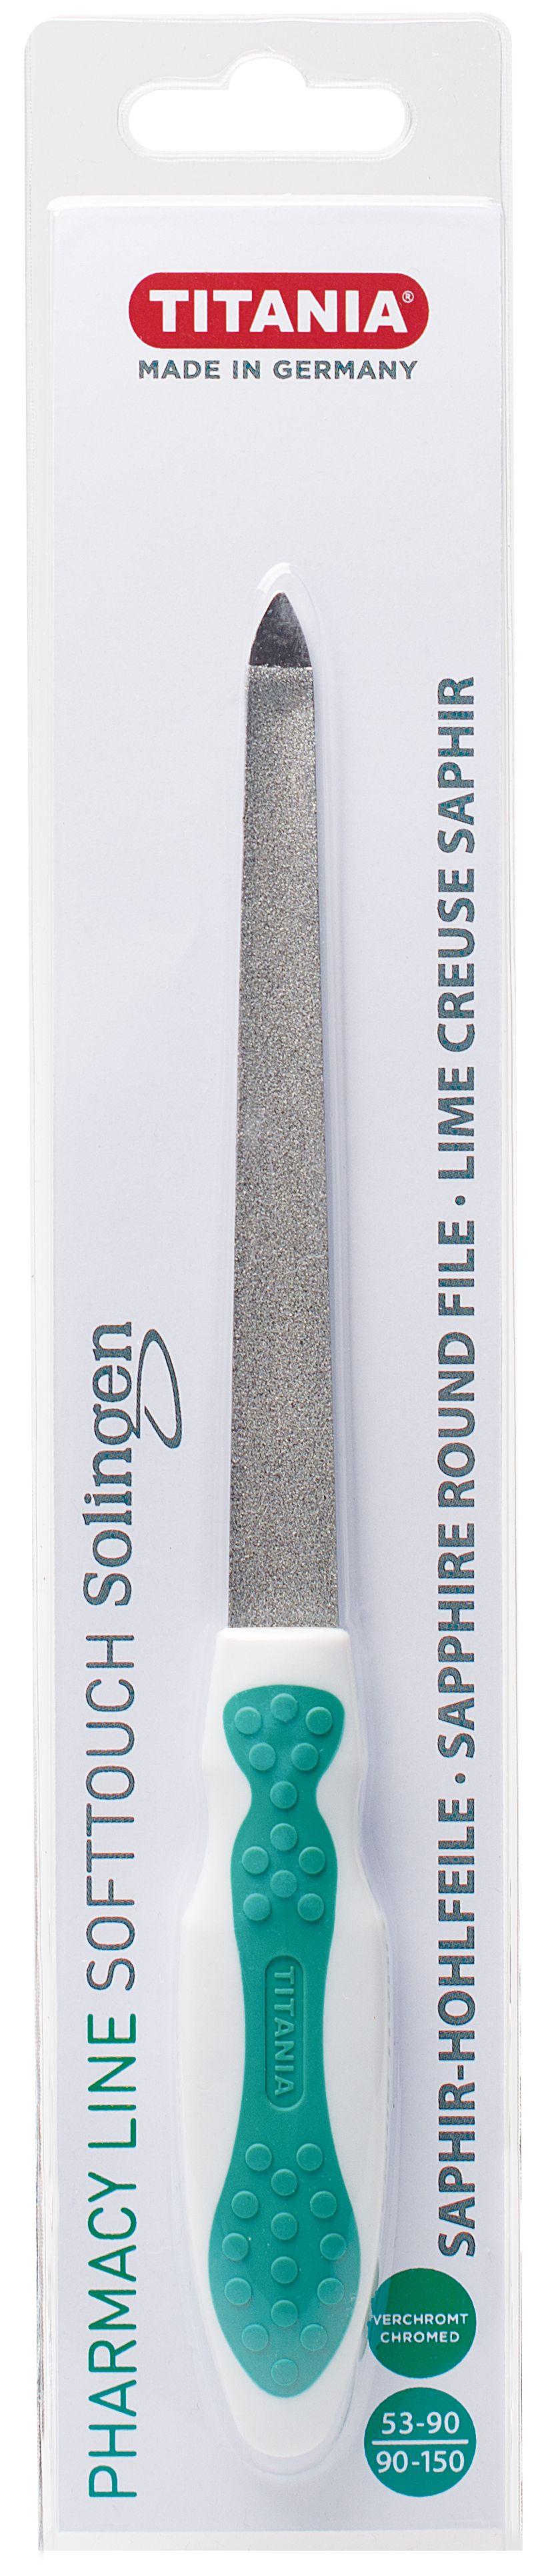 Titania SOLINGEN 1446 PH B safírový pilník na nehty oblý 1 ks